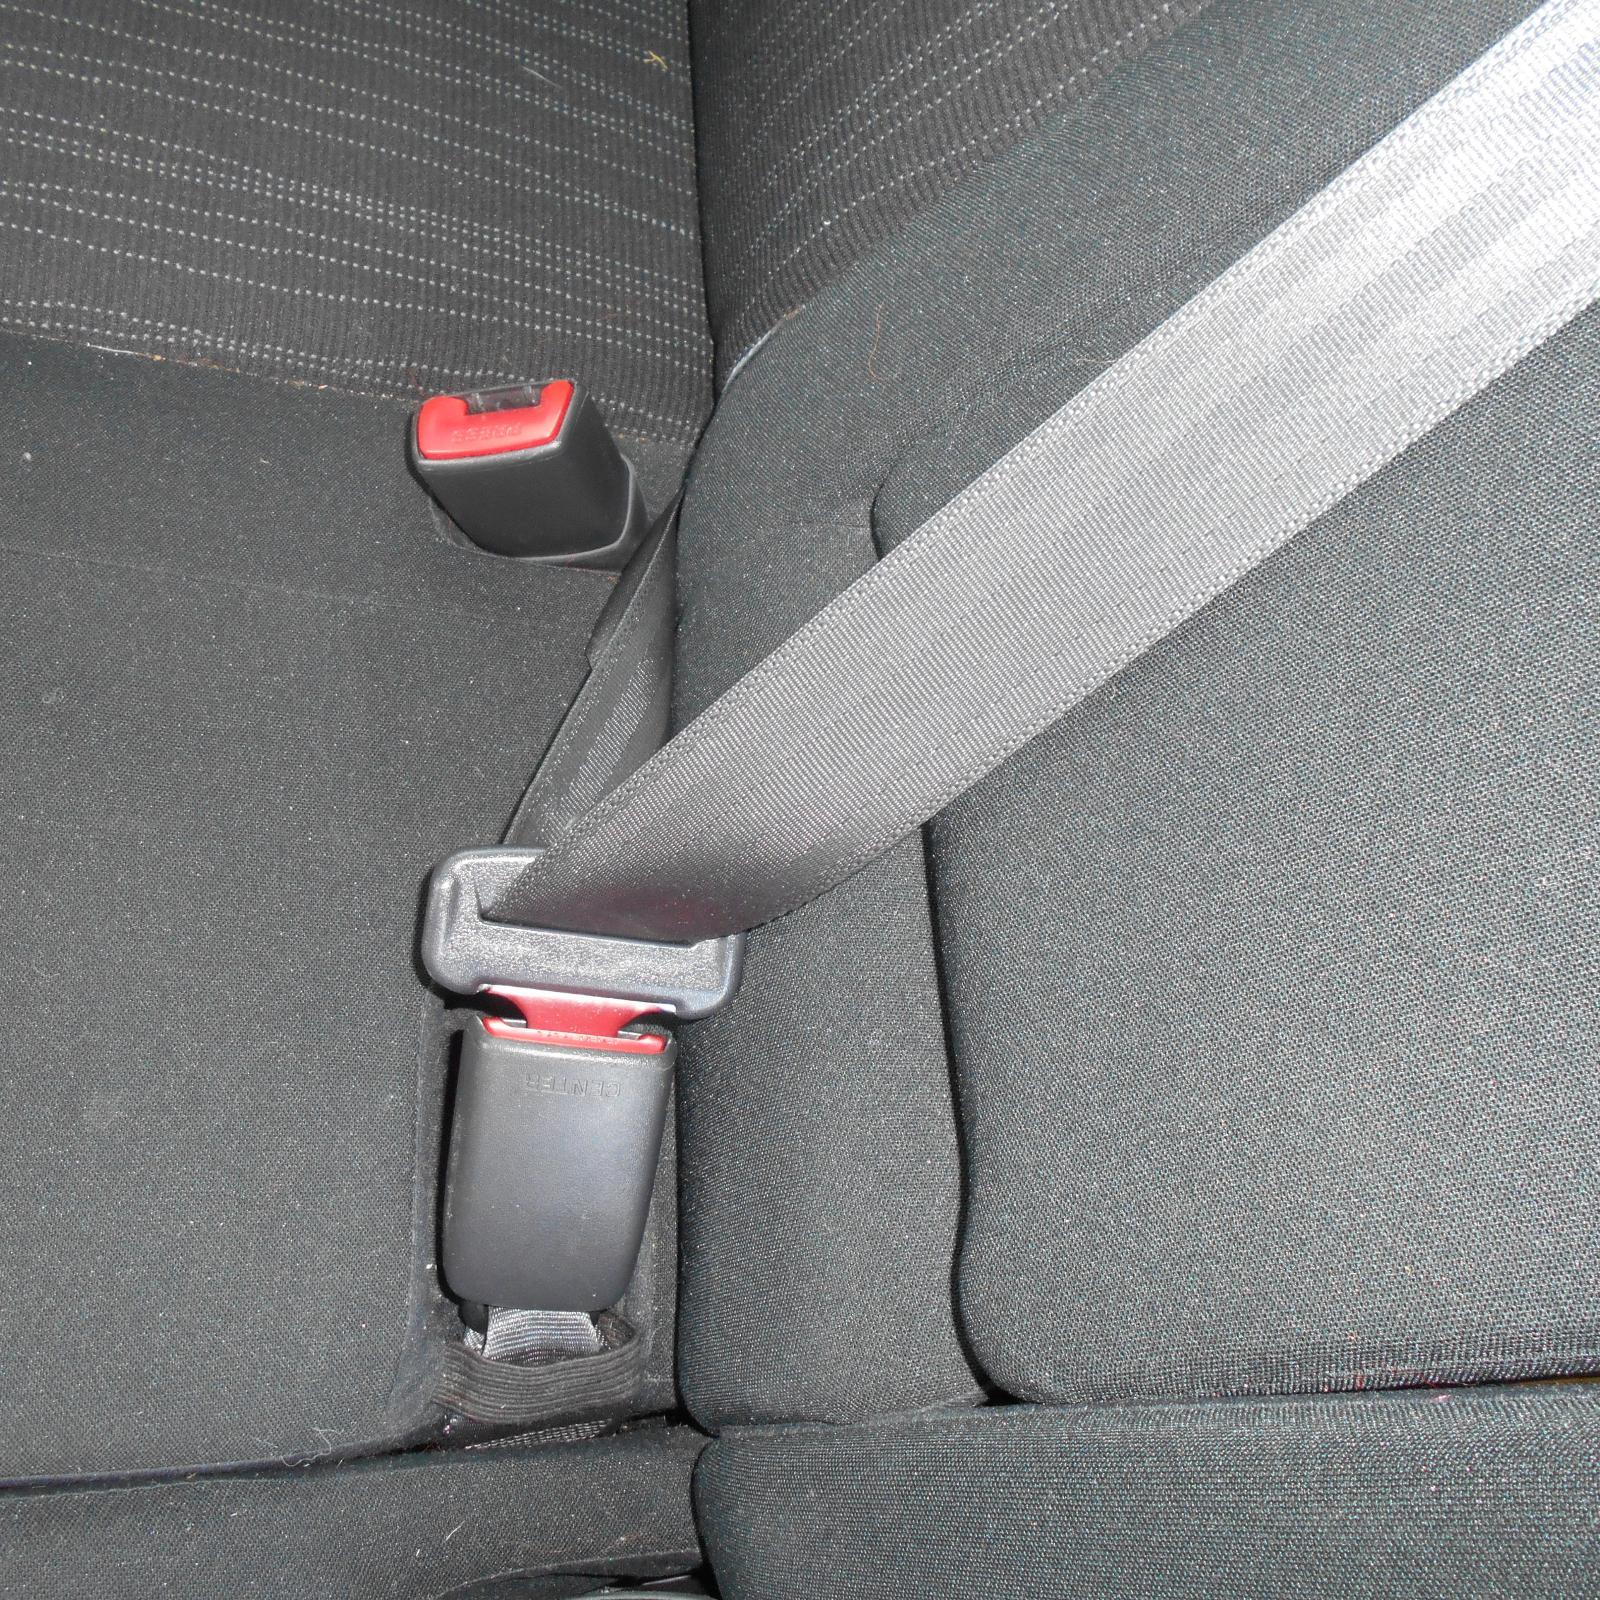 TOYOTA COROLLA, Seatbelt/Stalk, CENTRE REAR, SEAT BELT STALK ONLY, ZRE152R, HATCH, 03/07-09/12